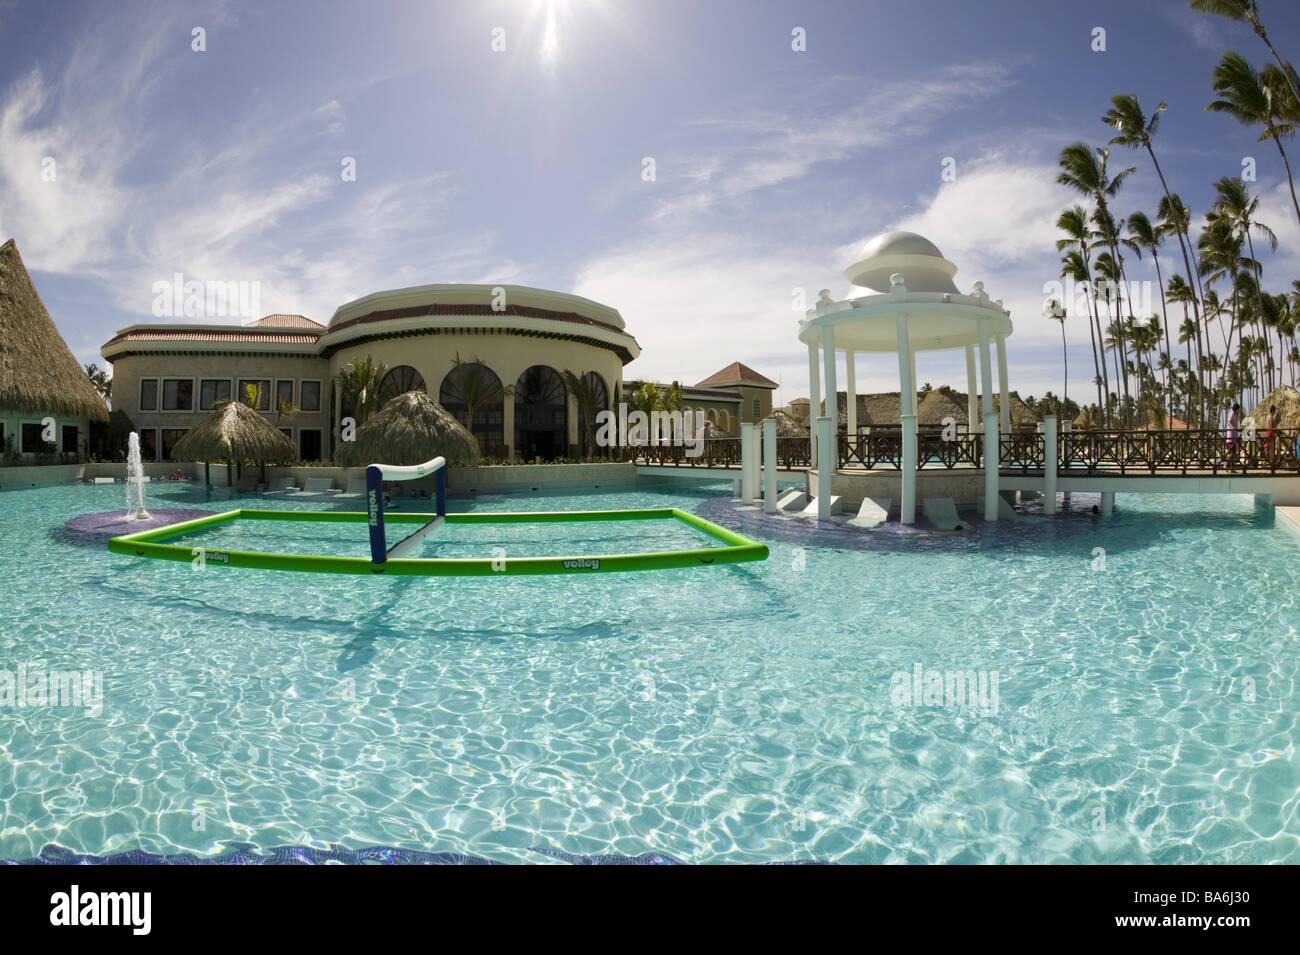 Dominican republic hotel-installation pool pavilion summers Caribbean big Antilles island hotel hotel-pool pool - Stock Image